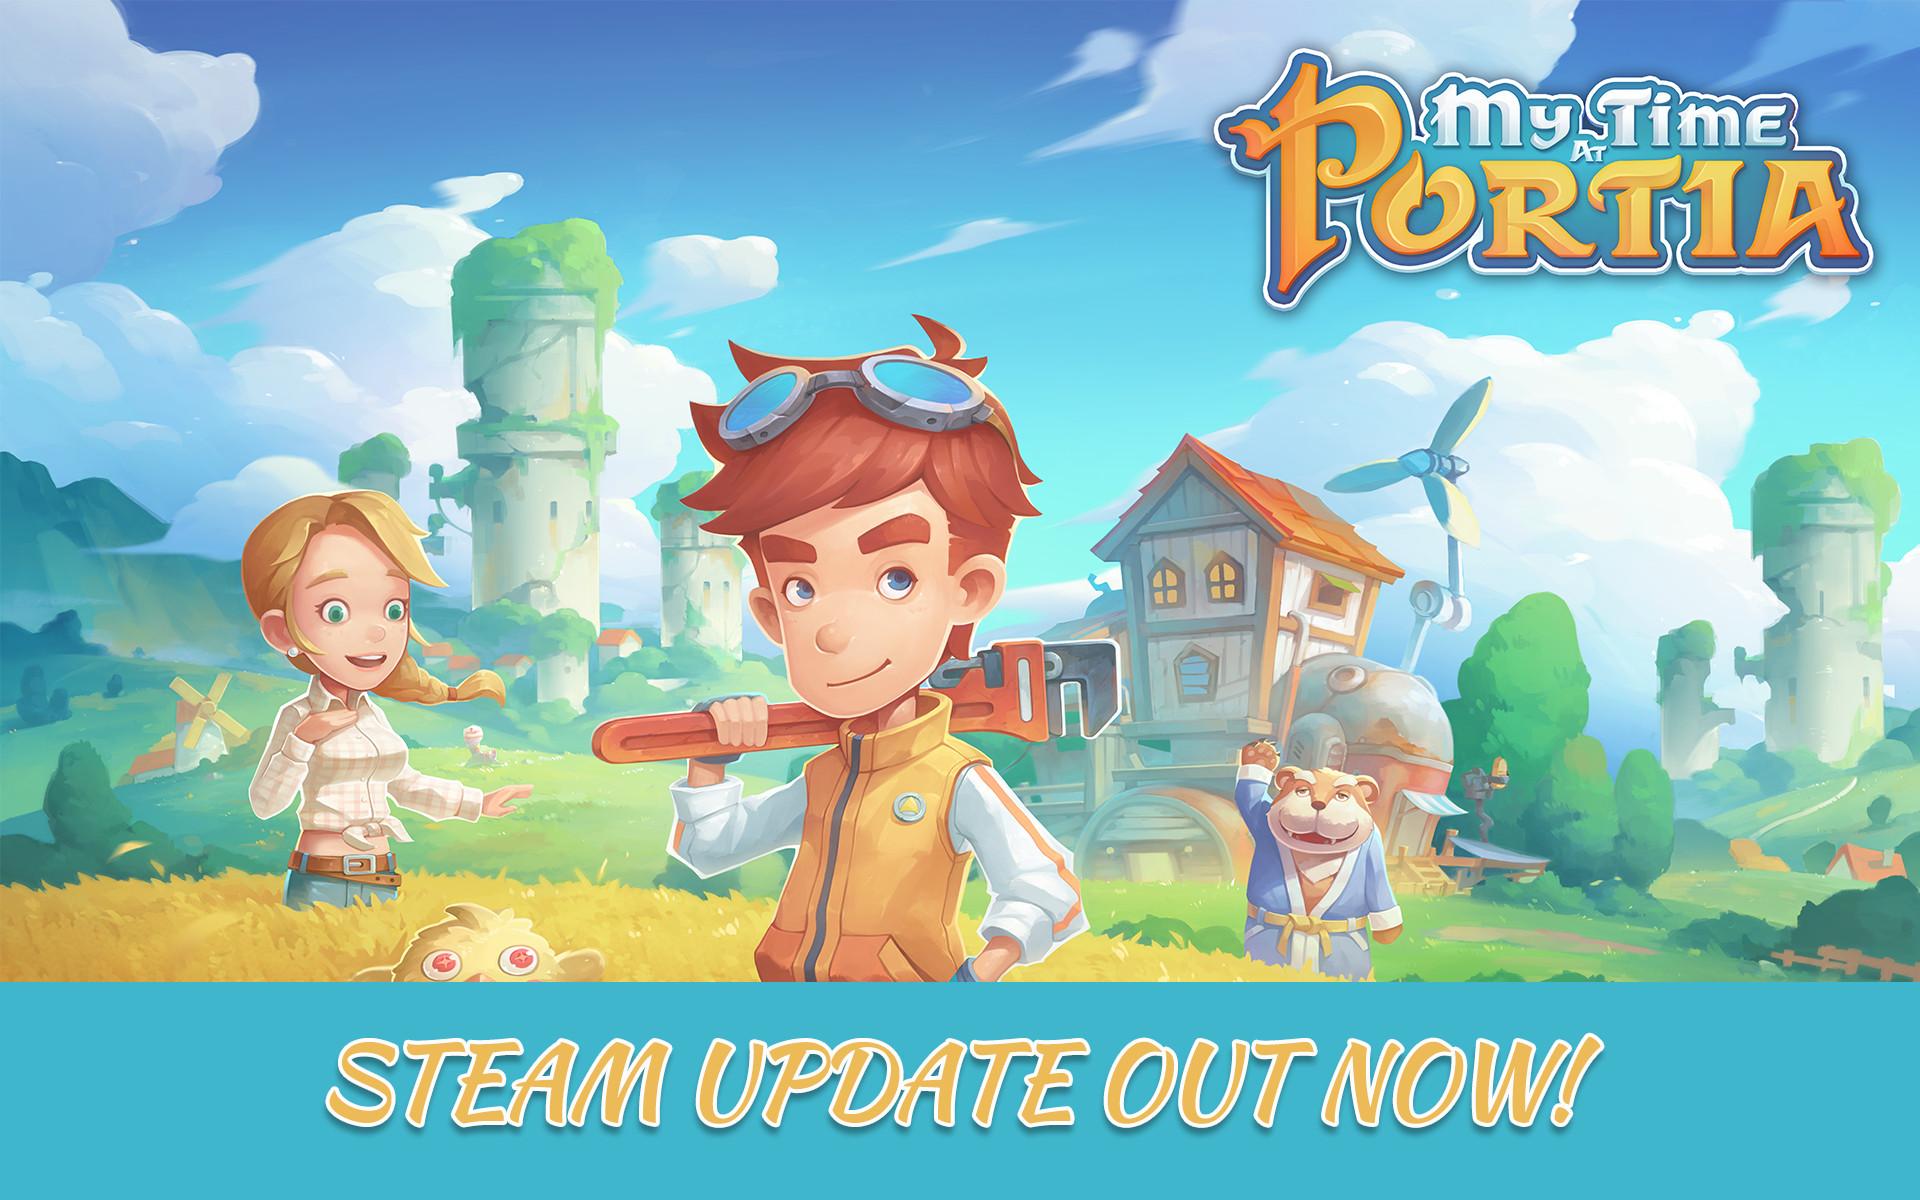 MTaP news - steam update